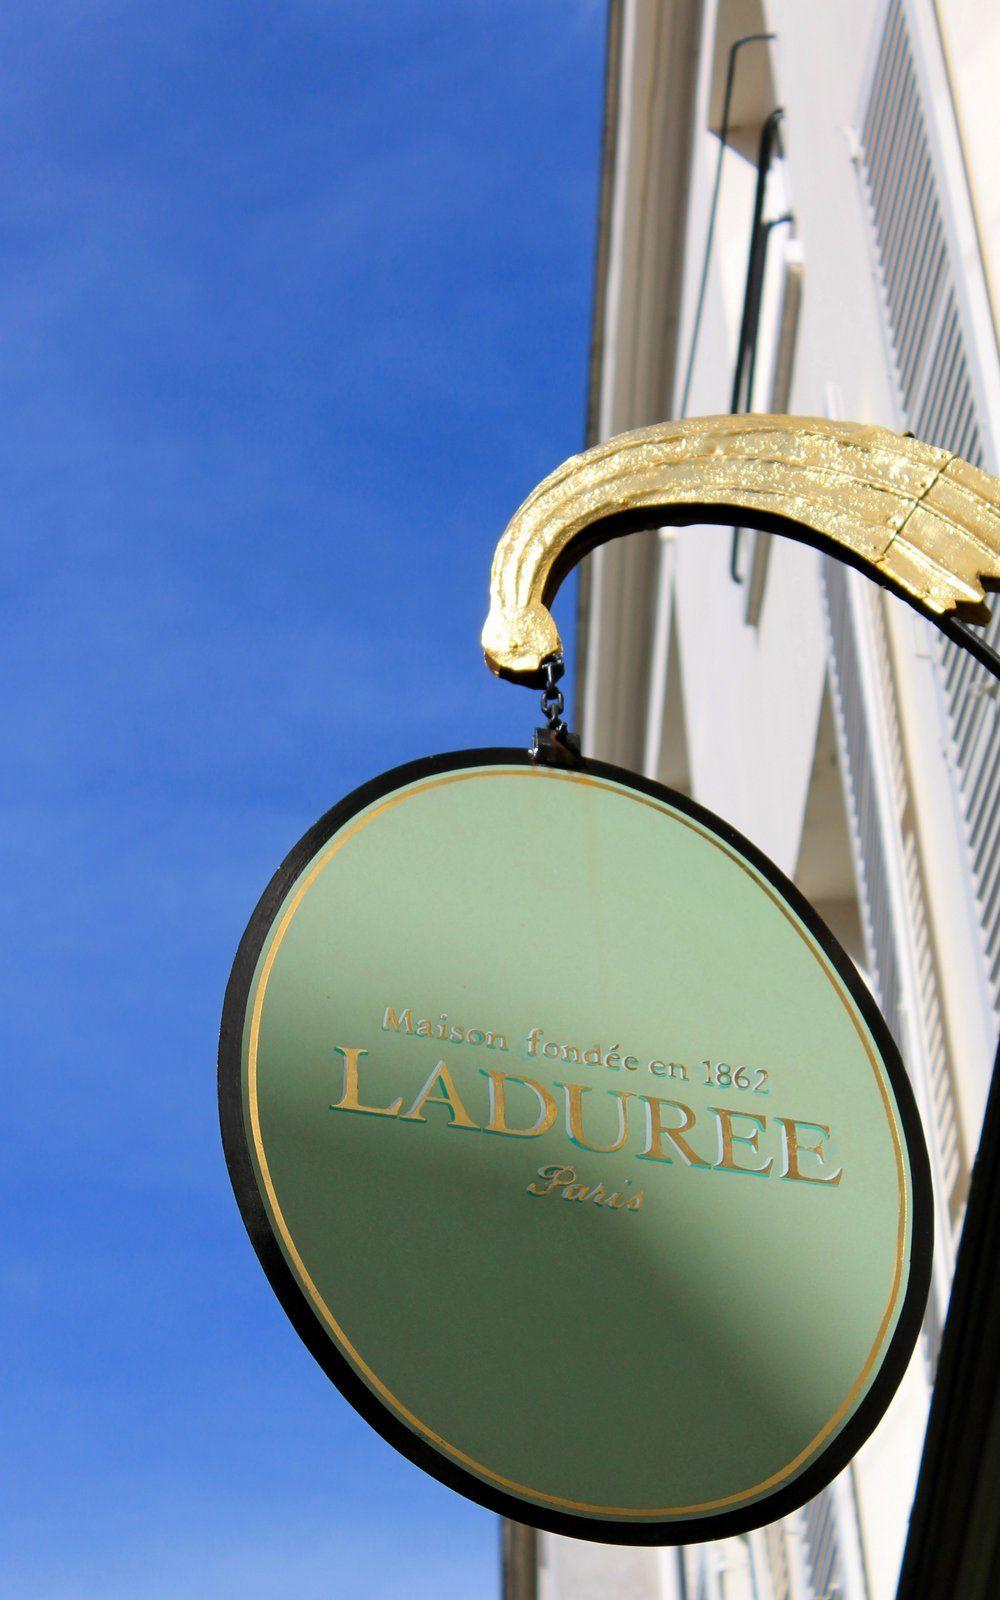 dac80e5353ec4 eat read love...  Laduree Tea Salon